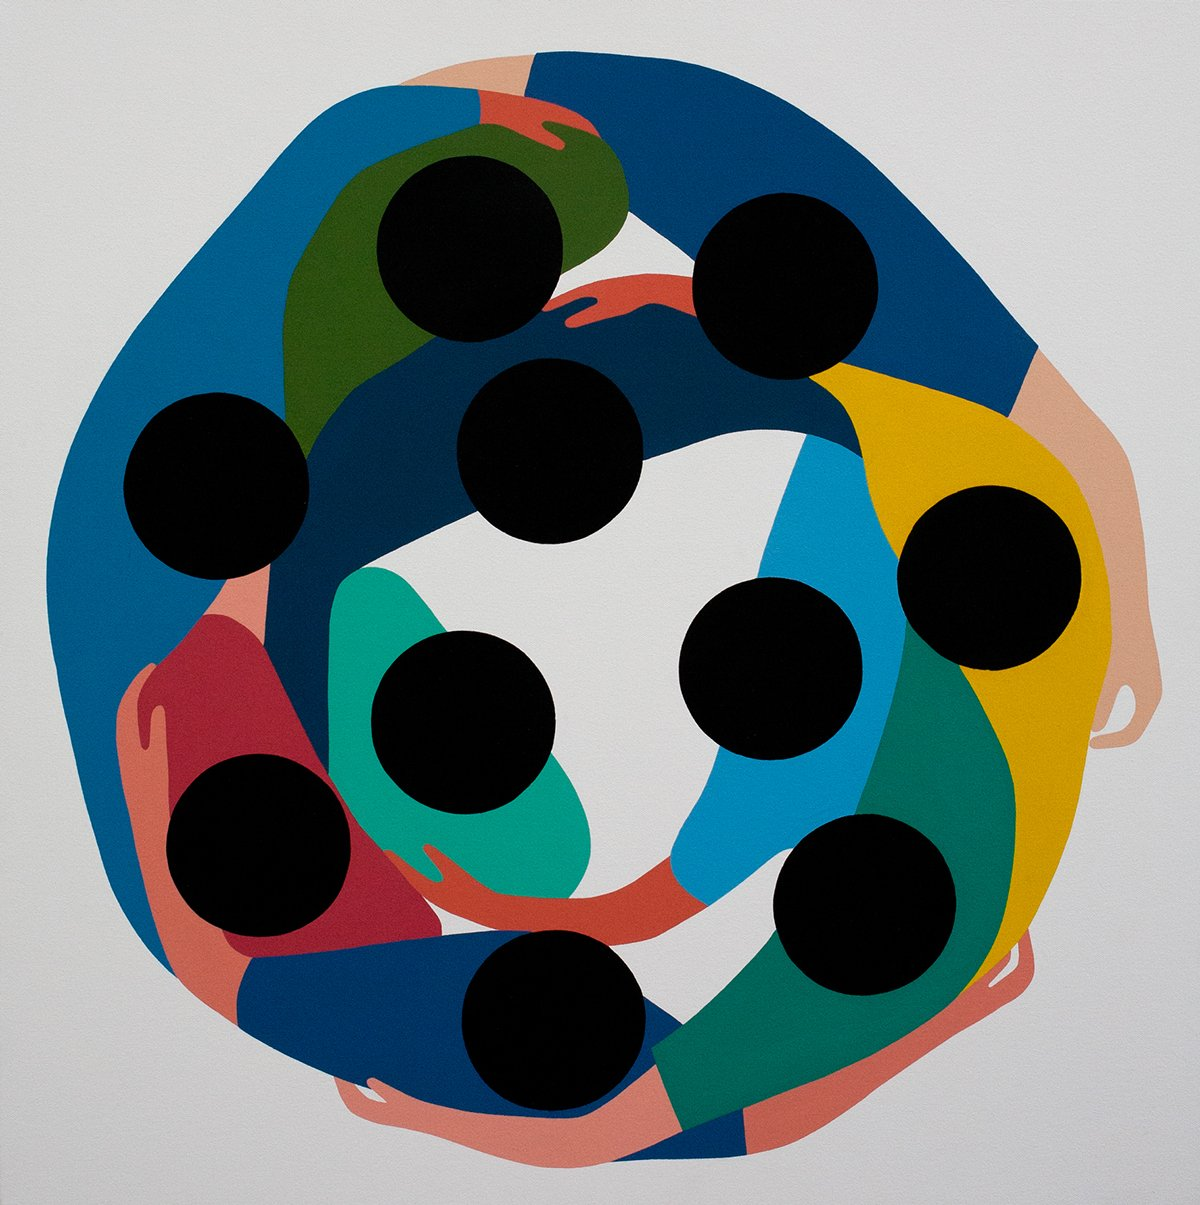 geoff_mcfetridge_paintings-designplayground_13